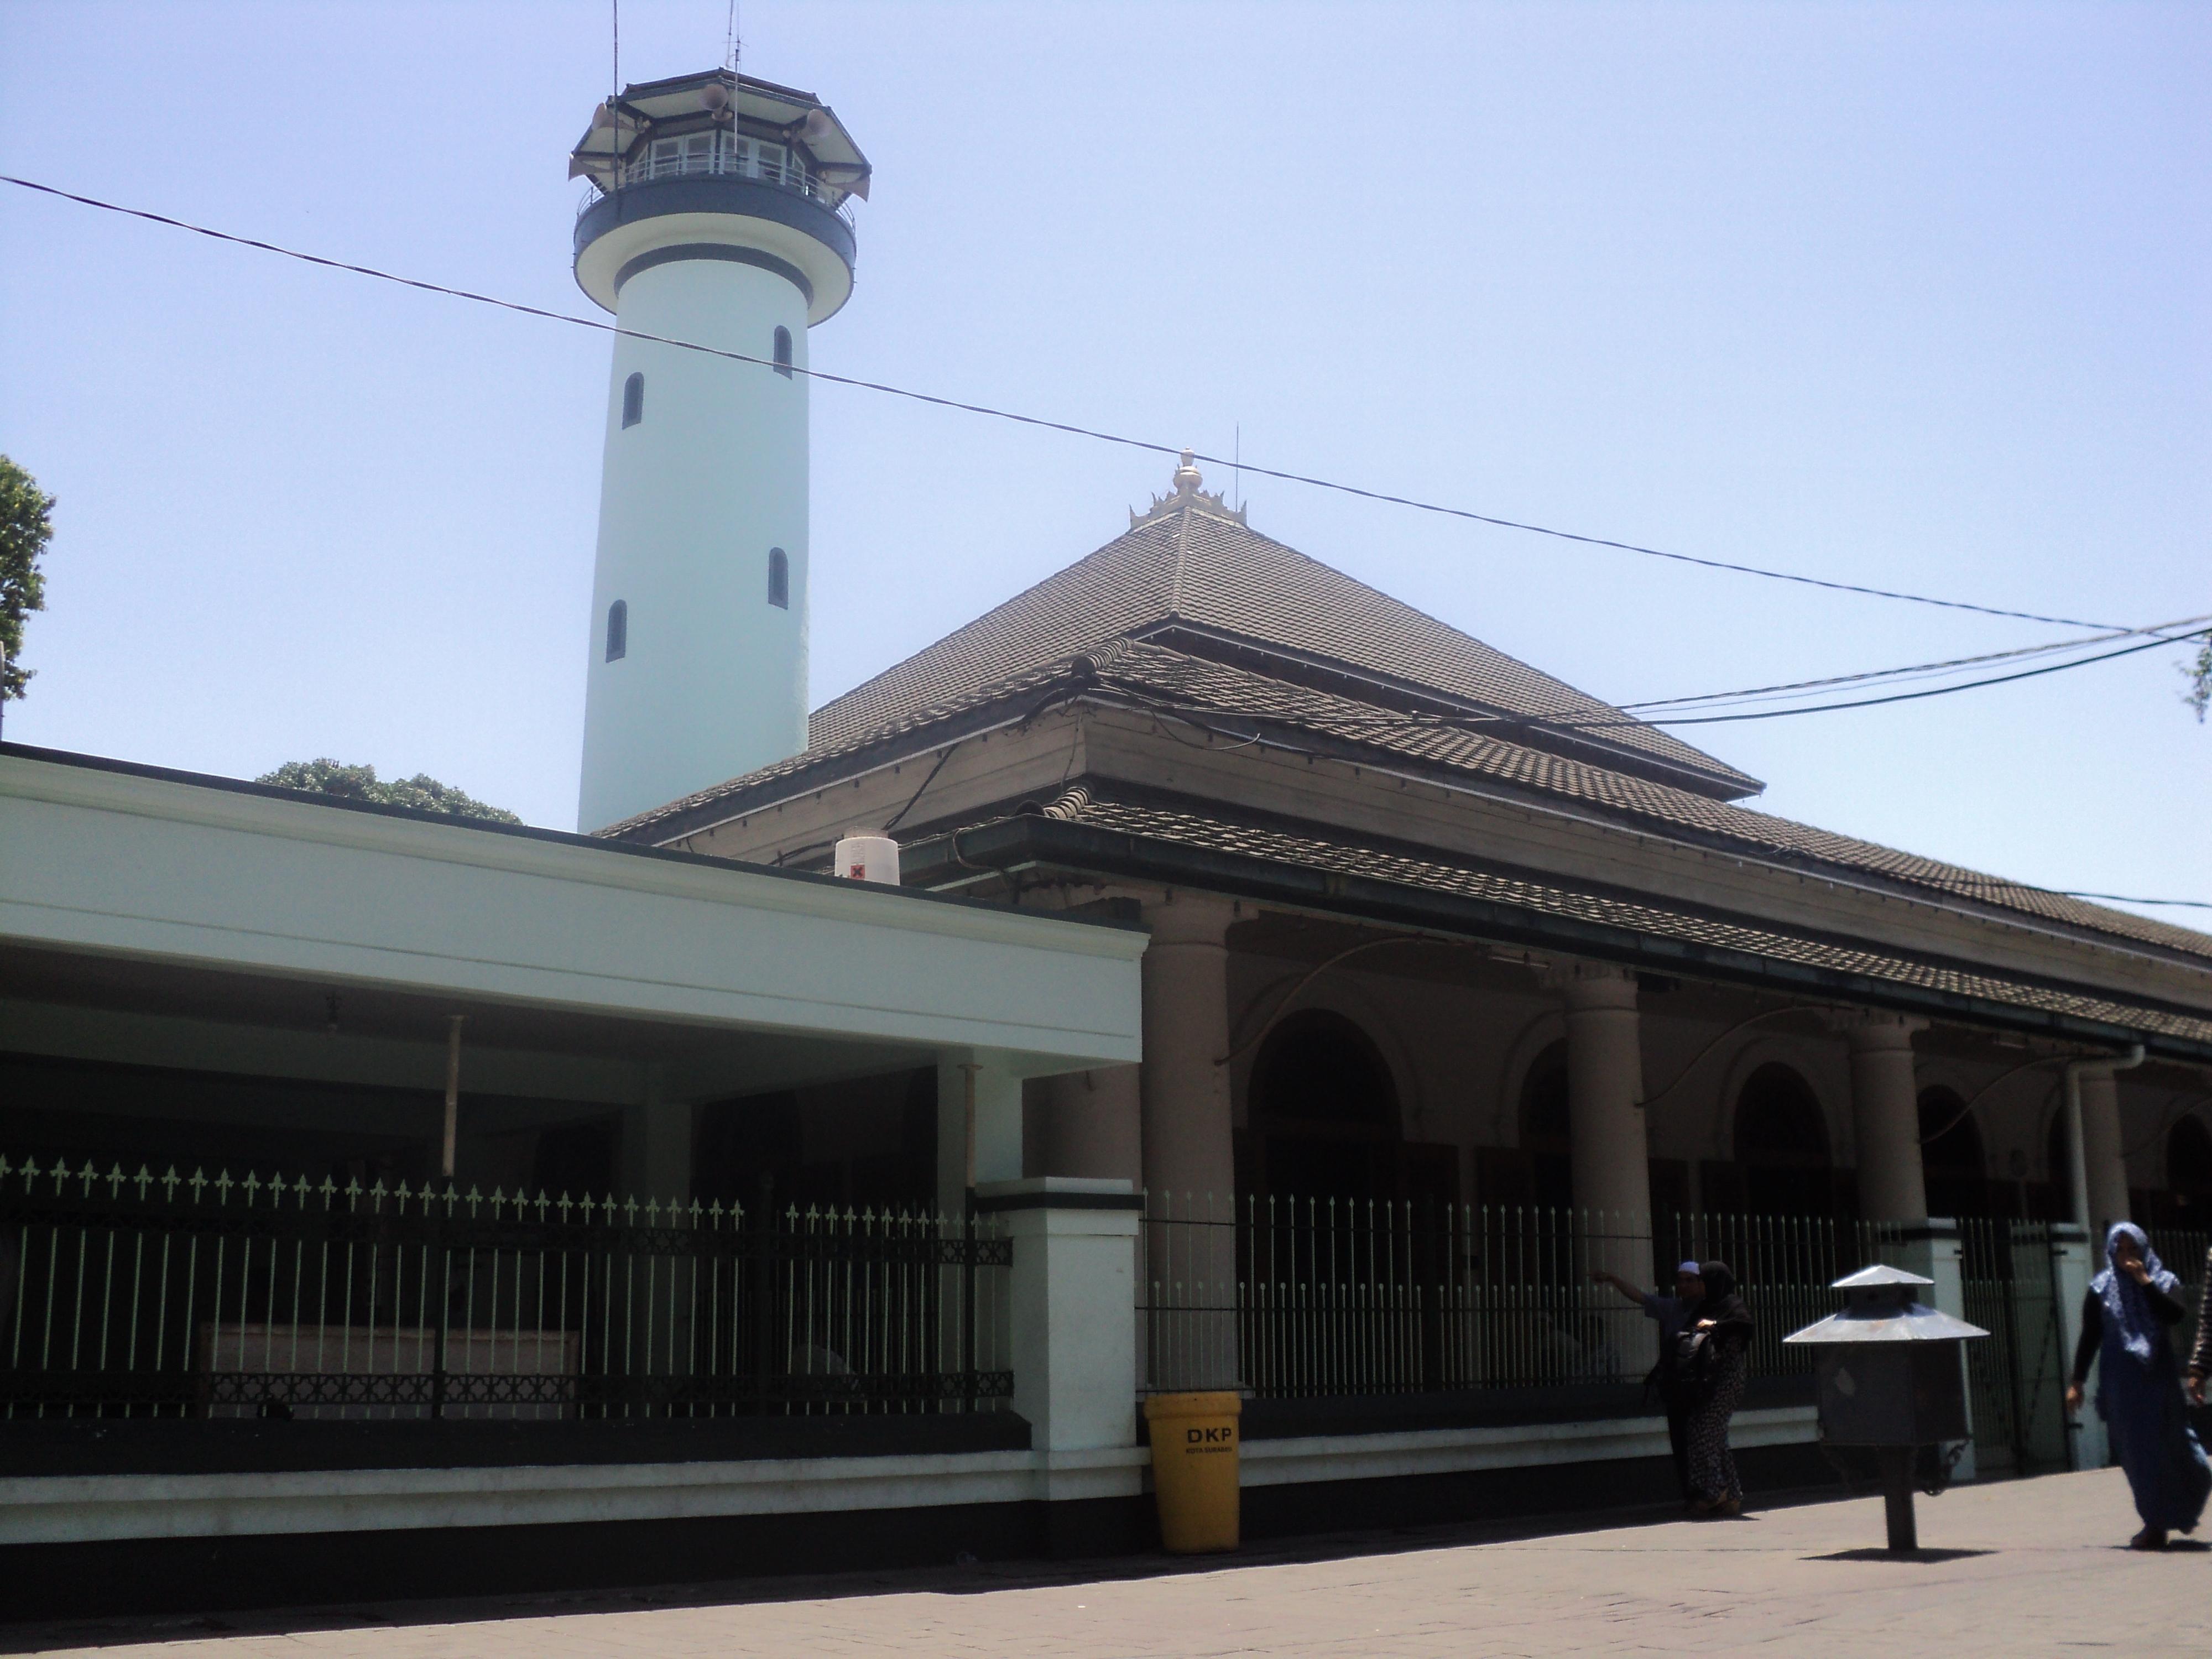 Masjid Sunan Ampel Pesona Cagar Budaya Surabaya Kota